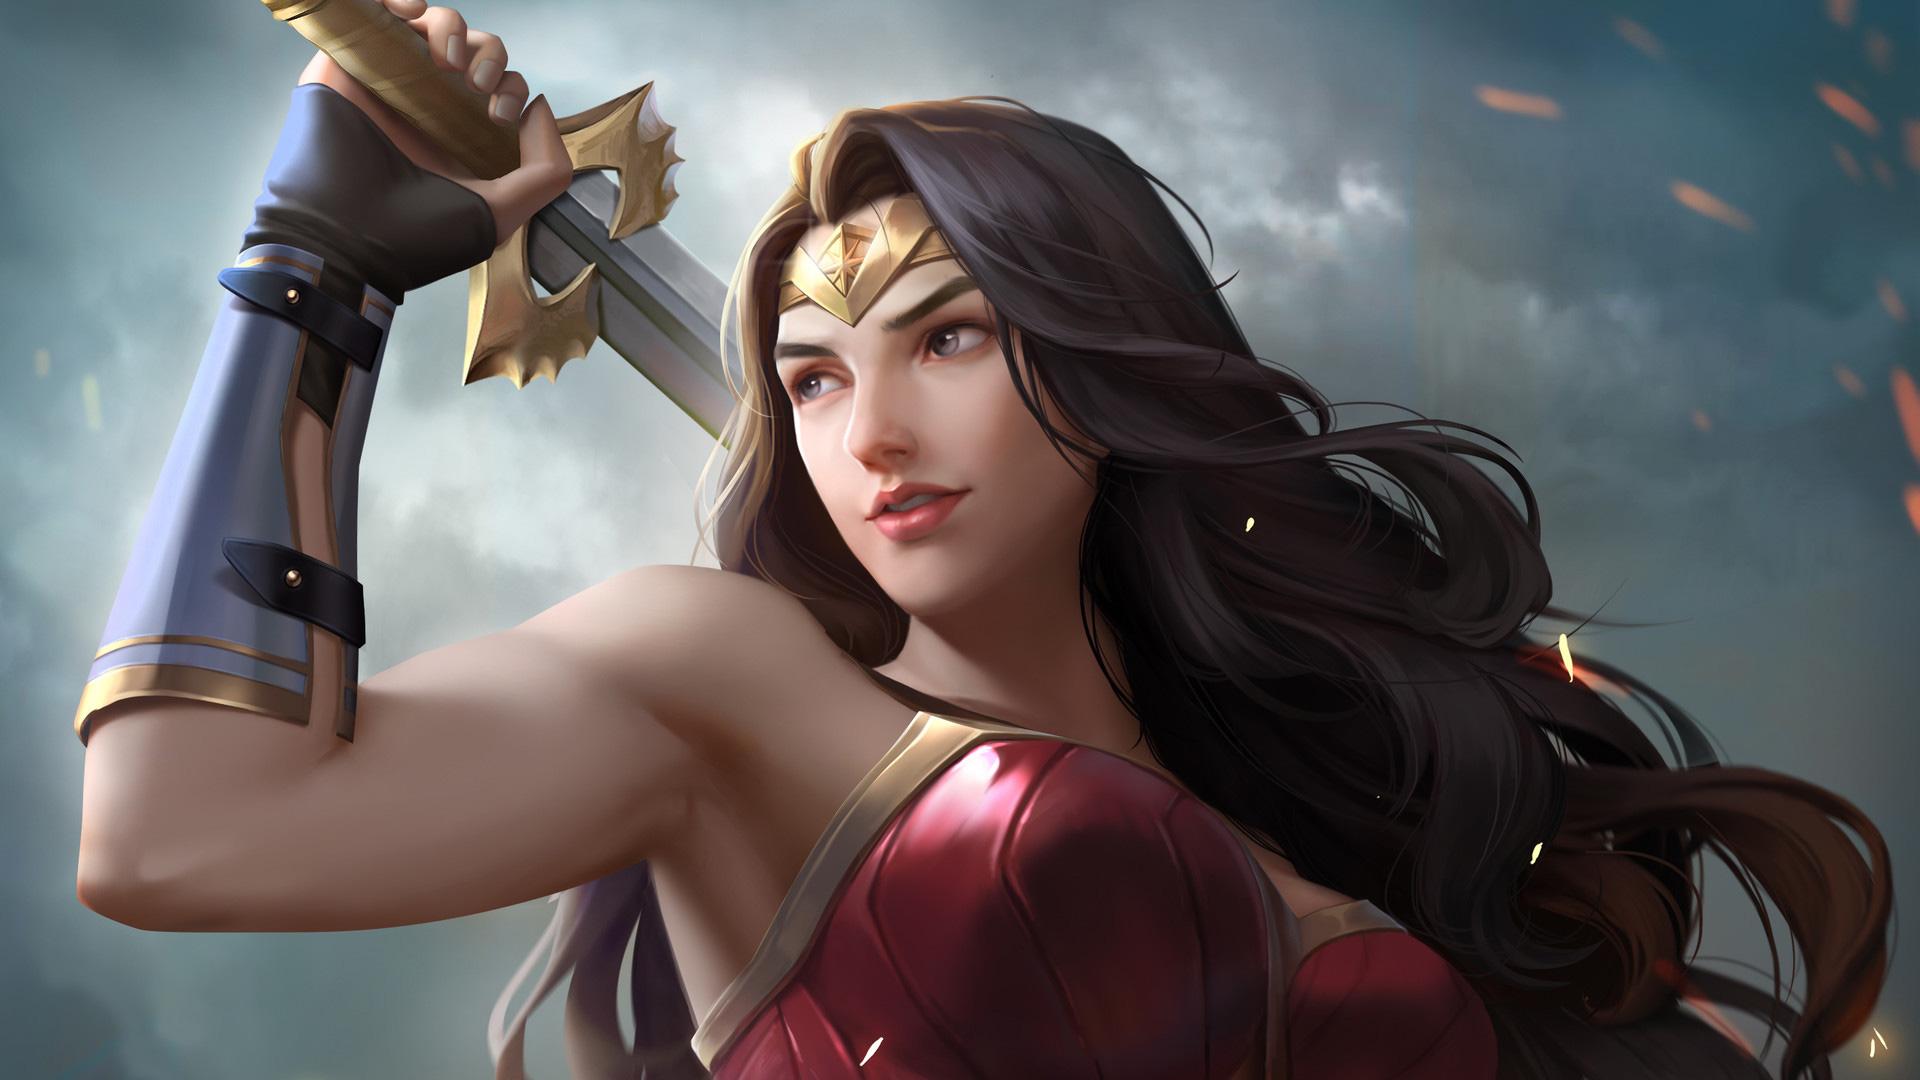 1280x1024 Wonder Woman Movie 1280x1024 Resolution Hd 4k: Wonder Woman Artwork 2018 Latest, HD Superheroes, 4k